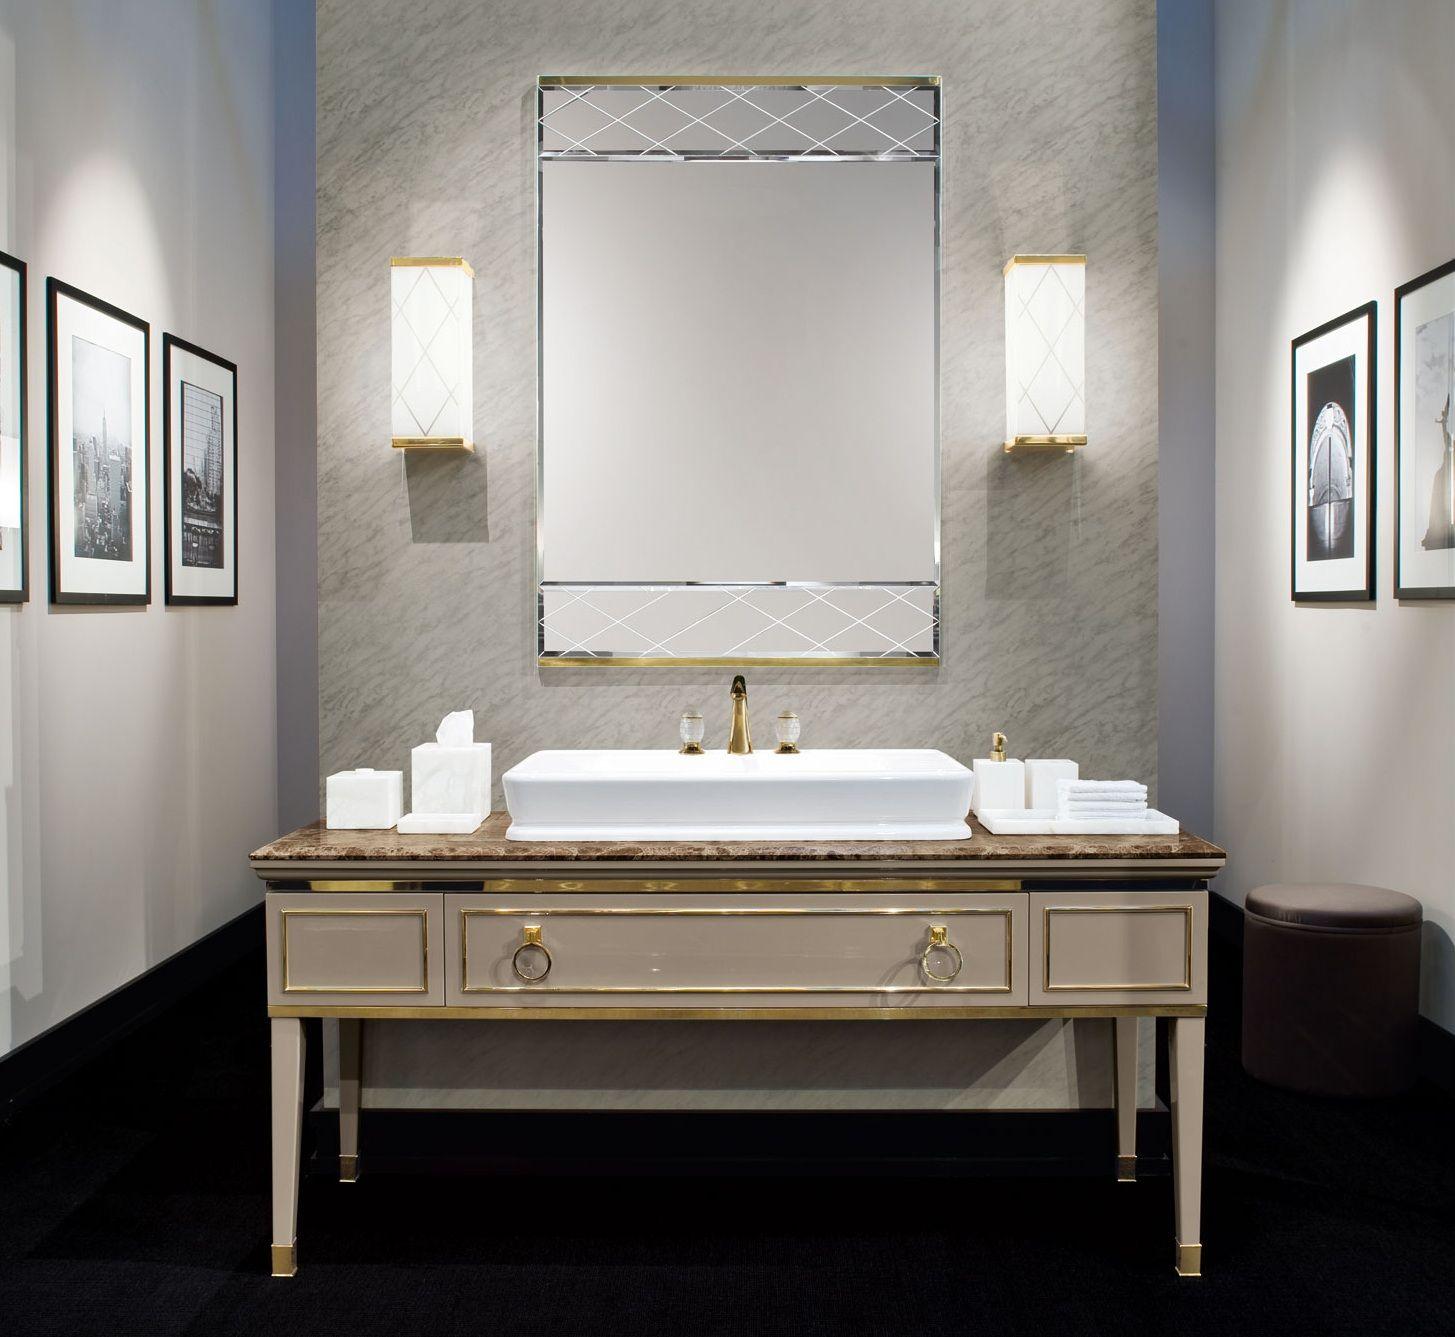 Luxury luxury homes luxury bedroom luxury bathroom luxury living